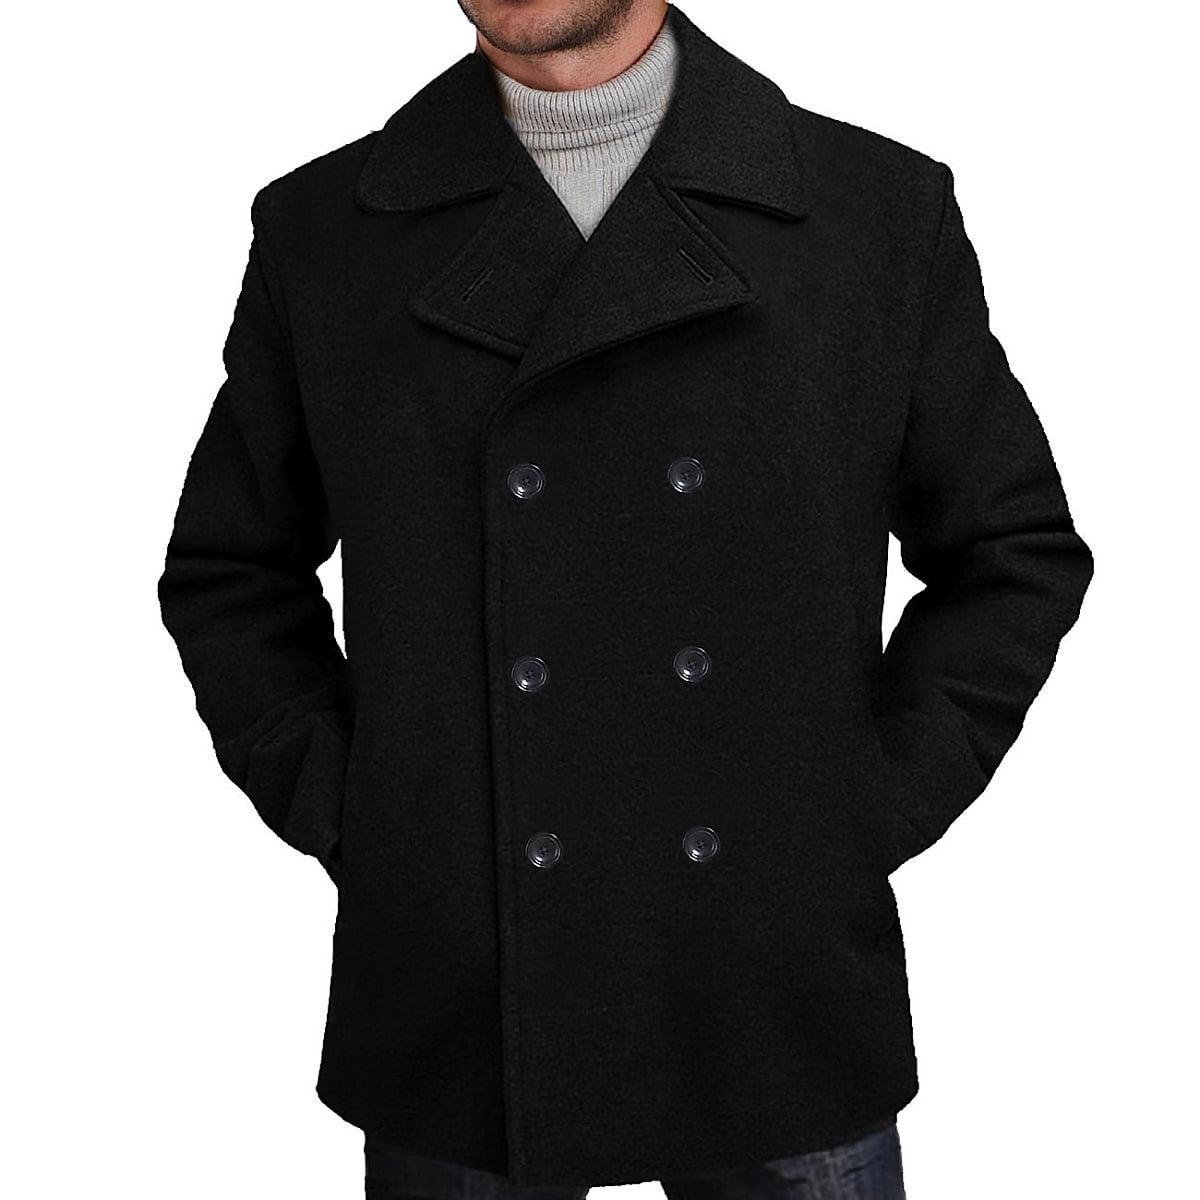 Men's 'Mark' Classic Wool Blend Pea Coat Regular Big & Tall by BGSD